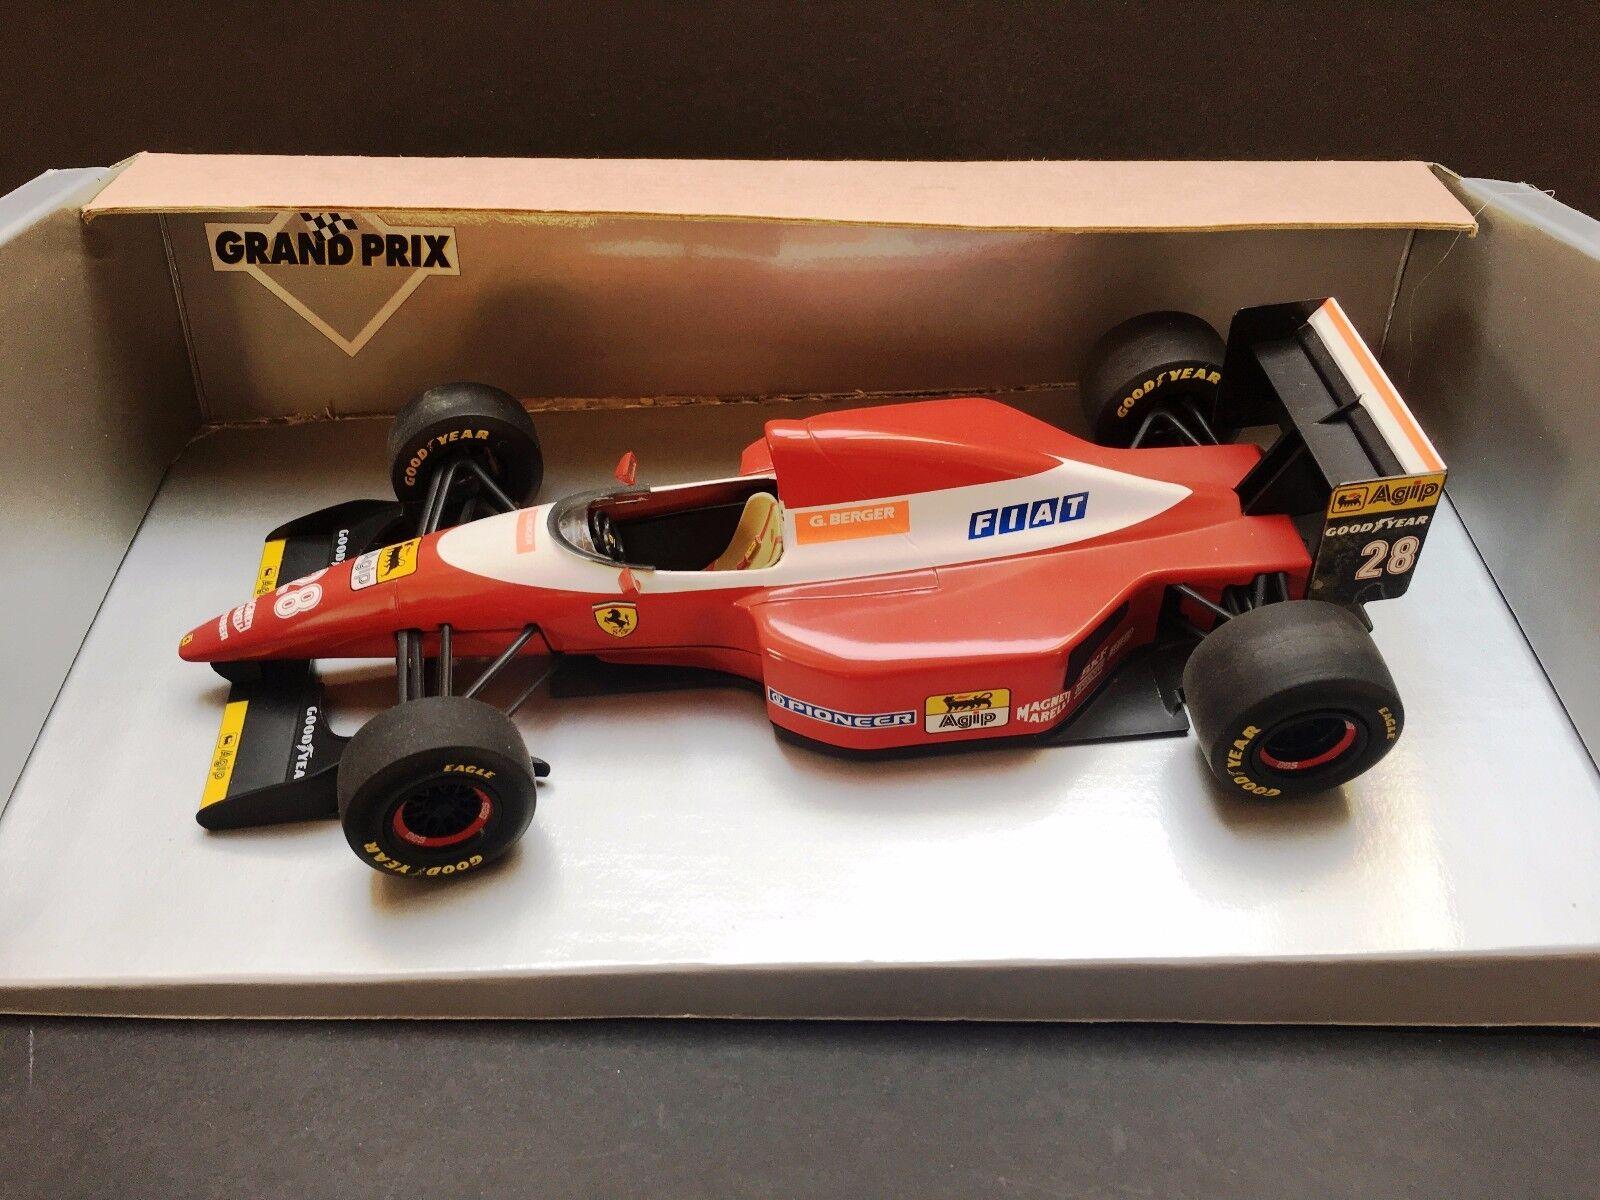 Minichamps - Gerhard Berger - Ferrari - F93A - 1993 - 1 18 - Very Rare